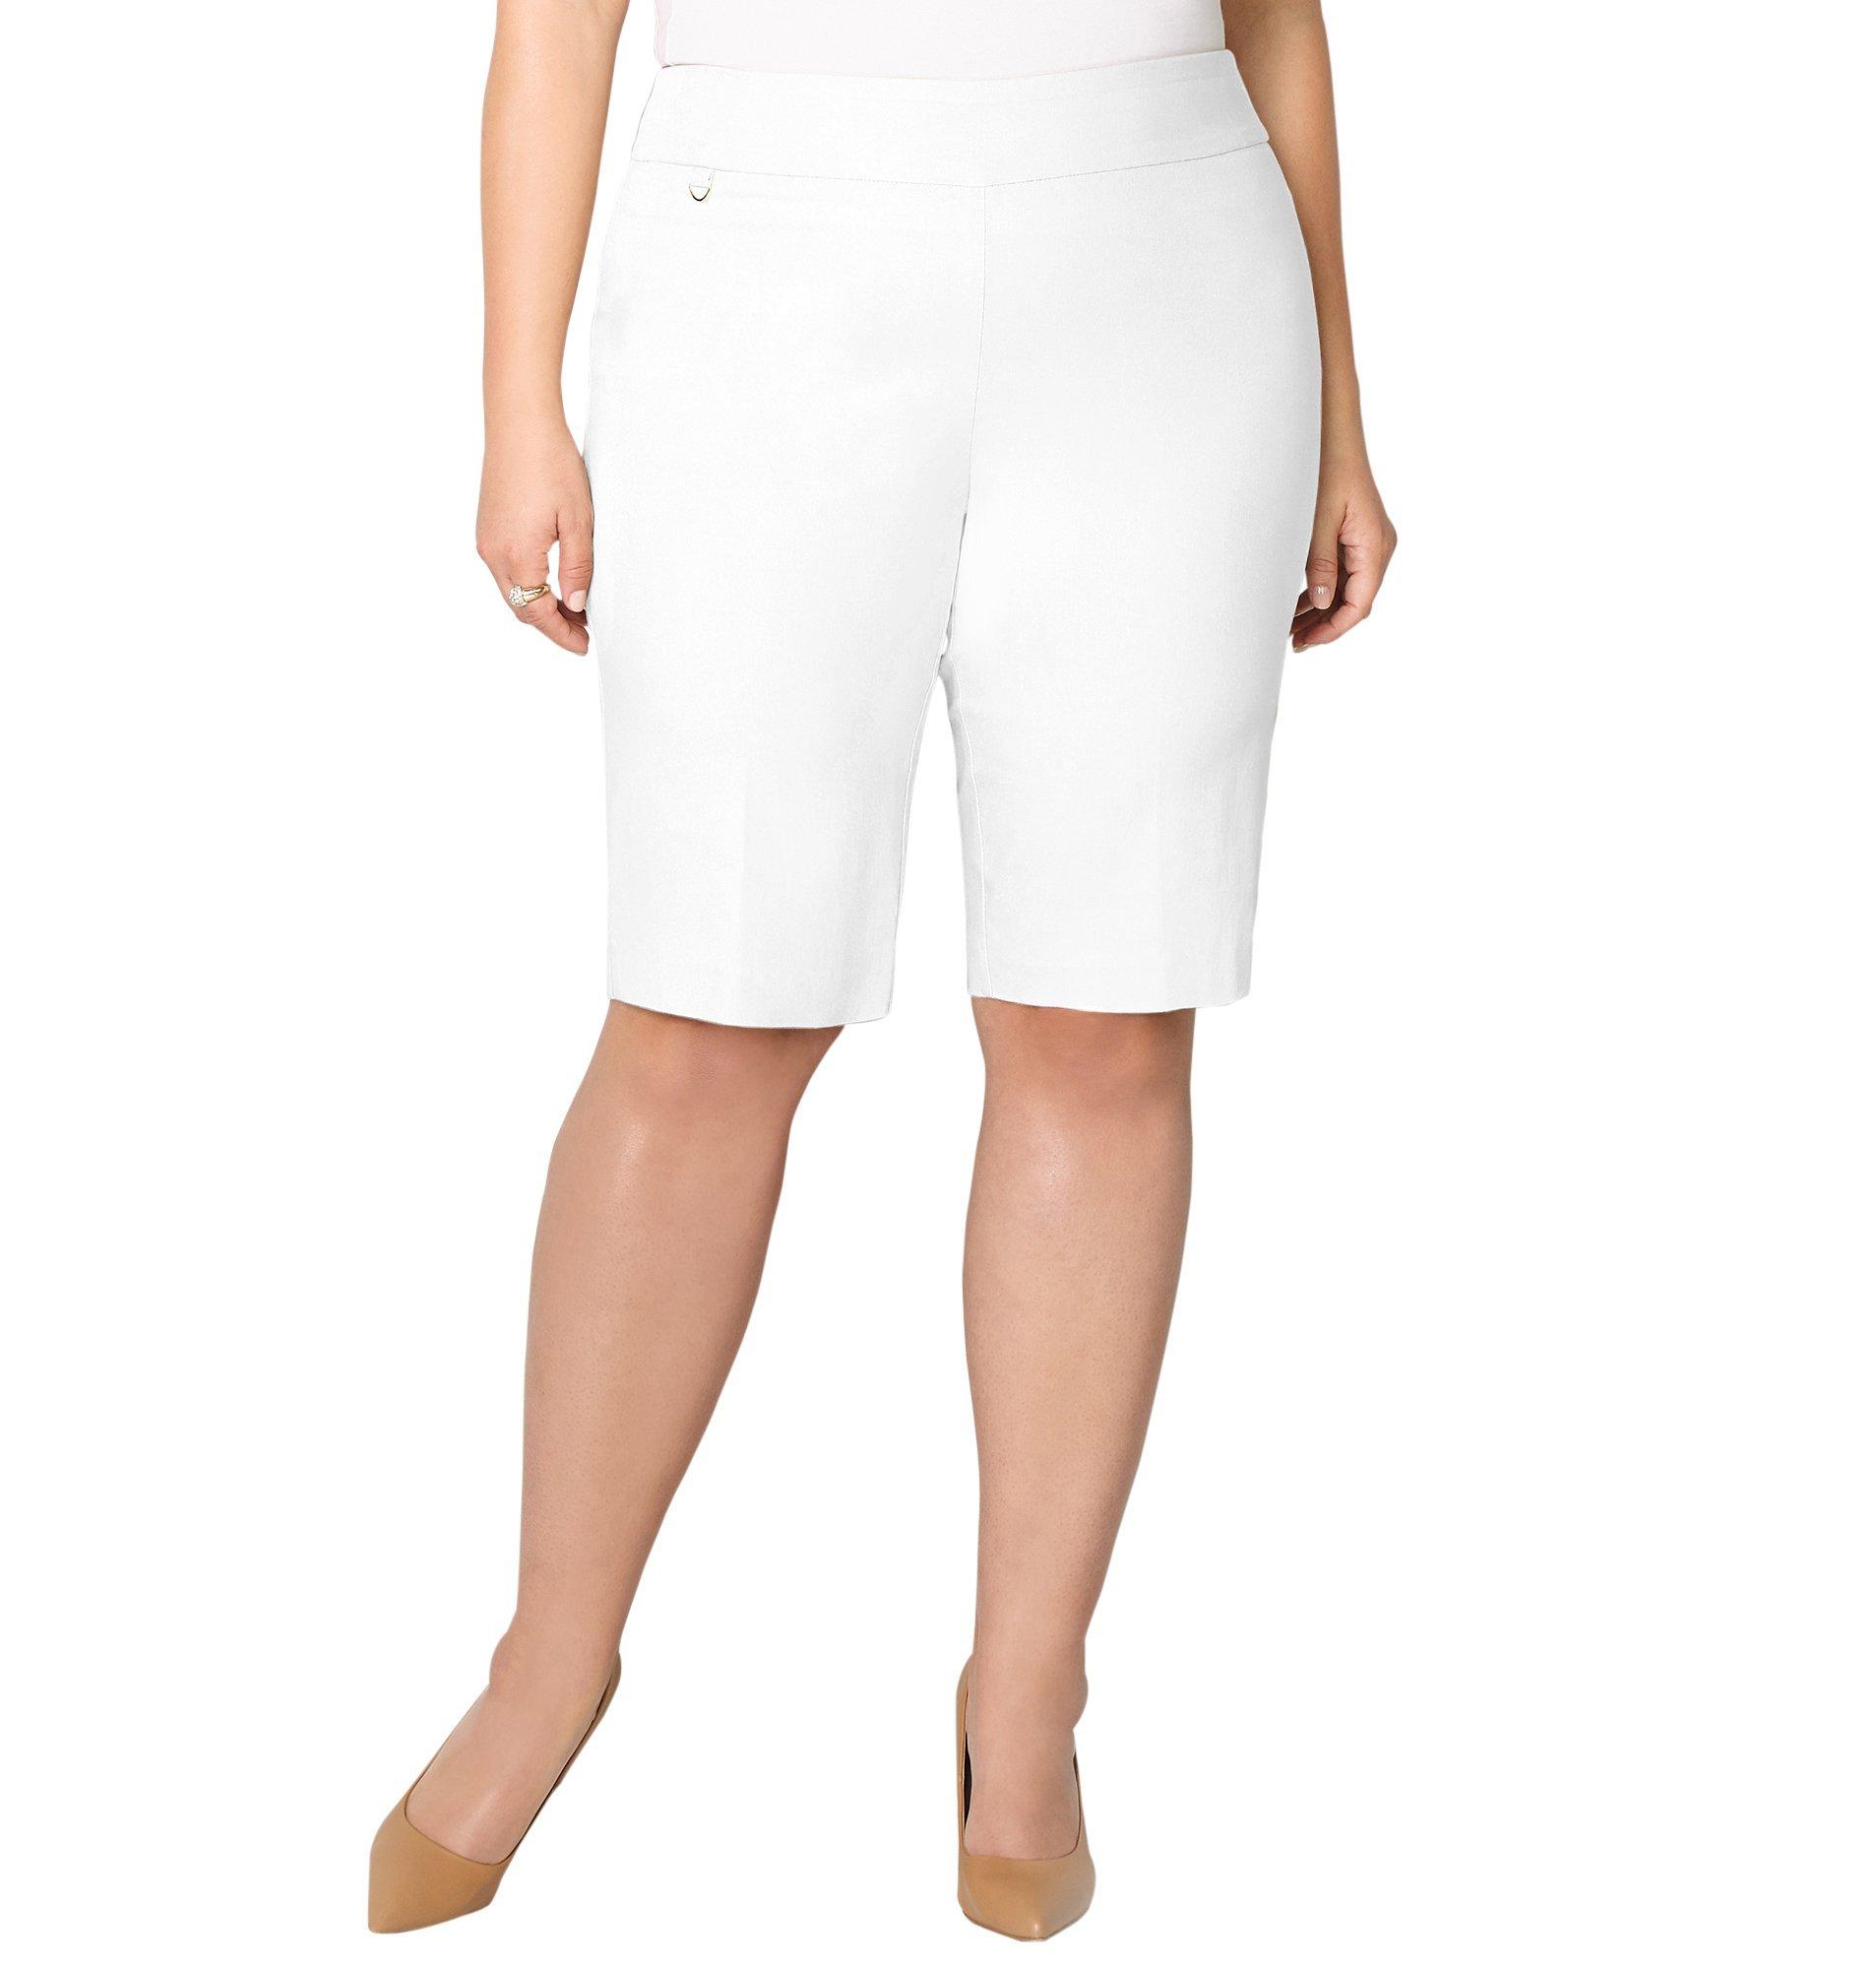 Avenue Women's Super Stretch Pull-On Bermuda Short, 18 White